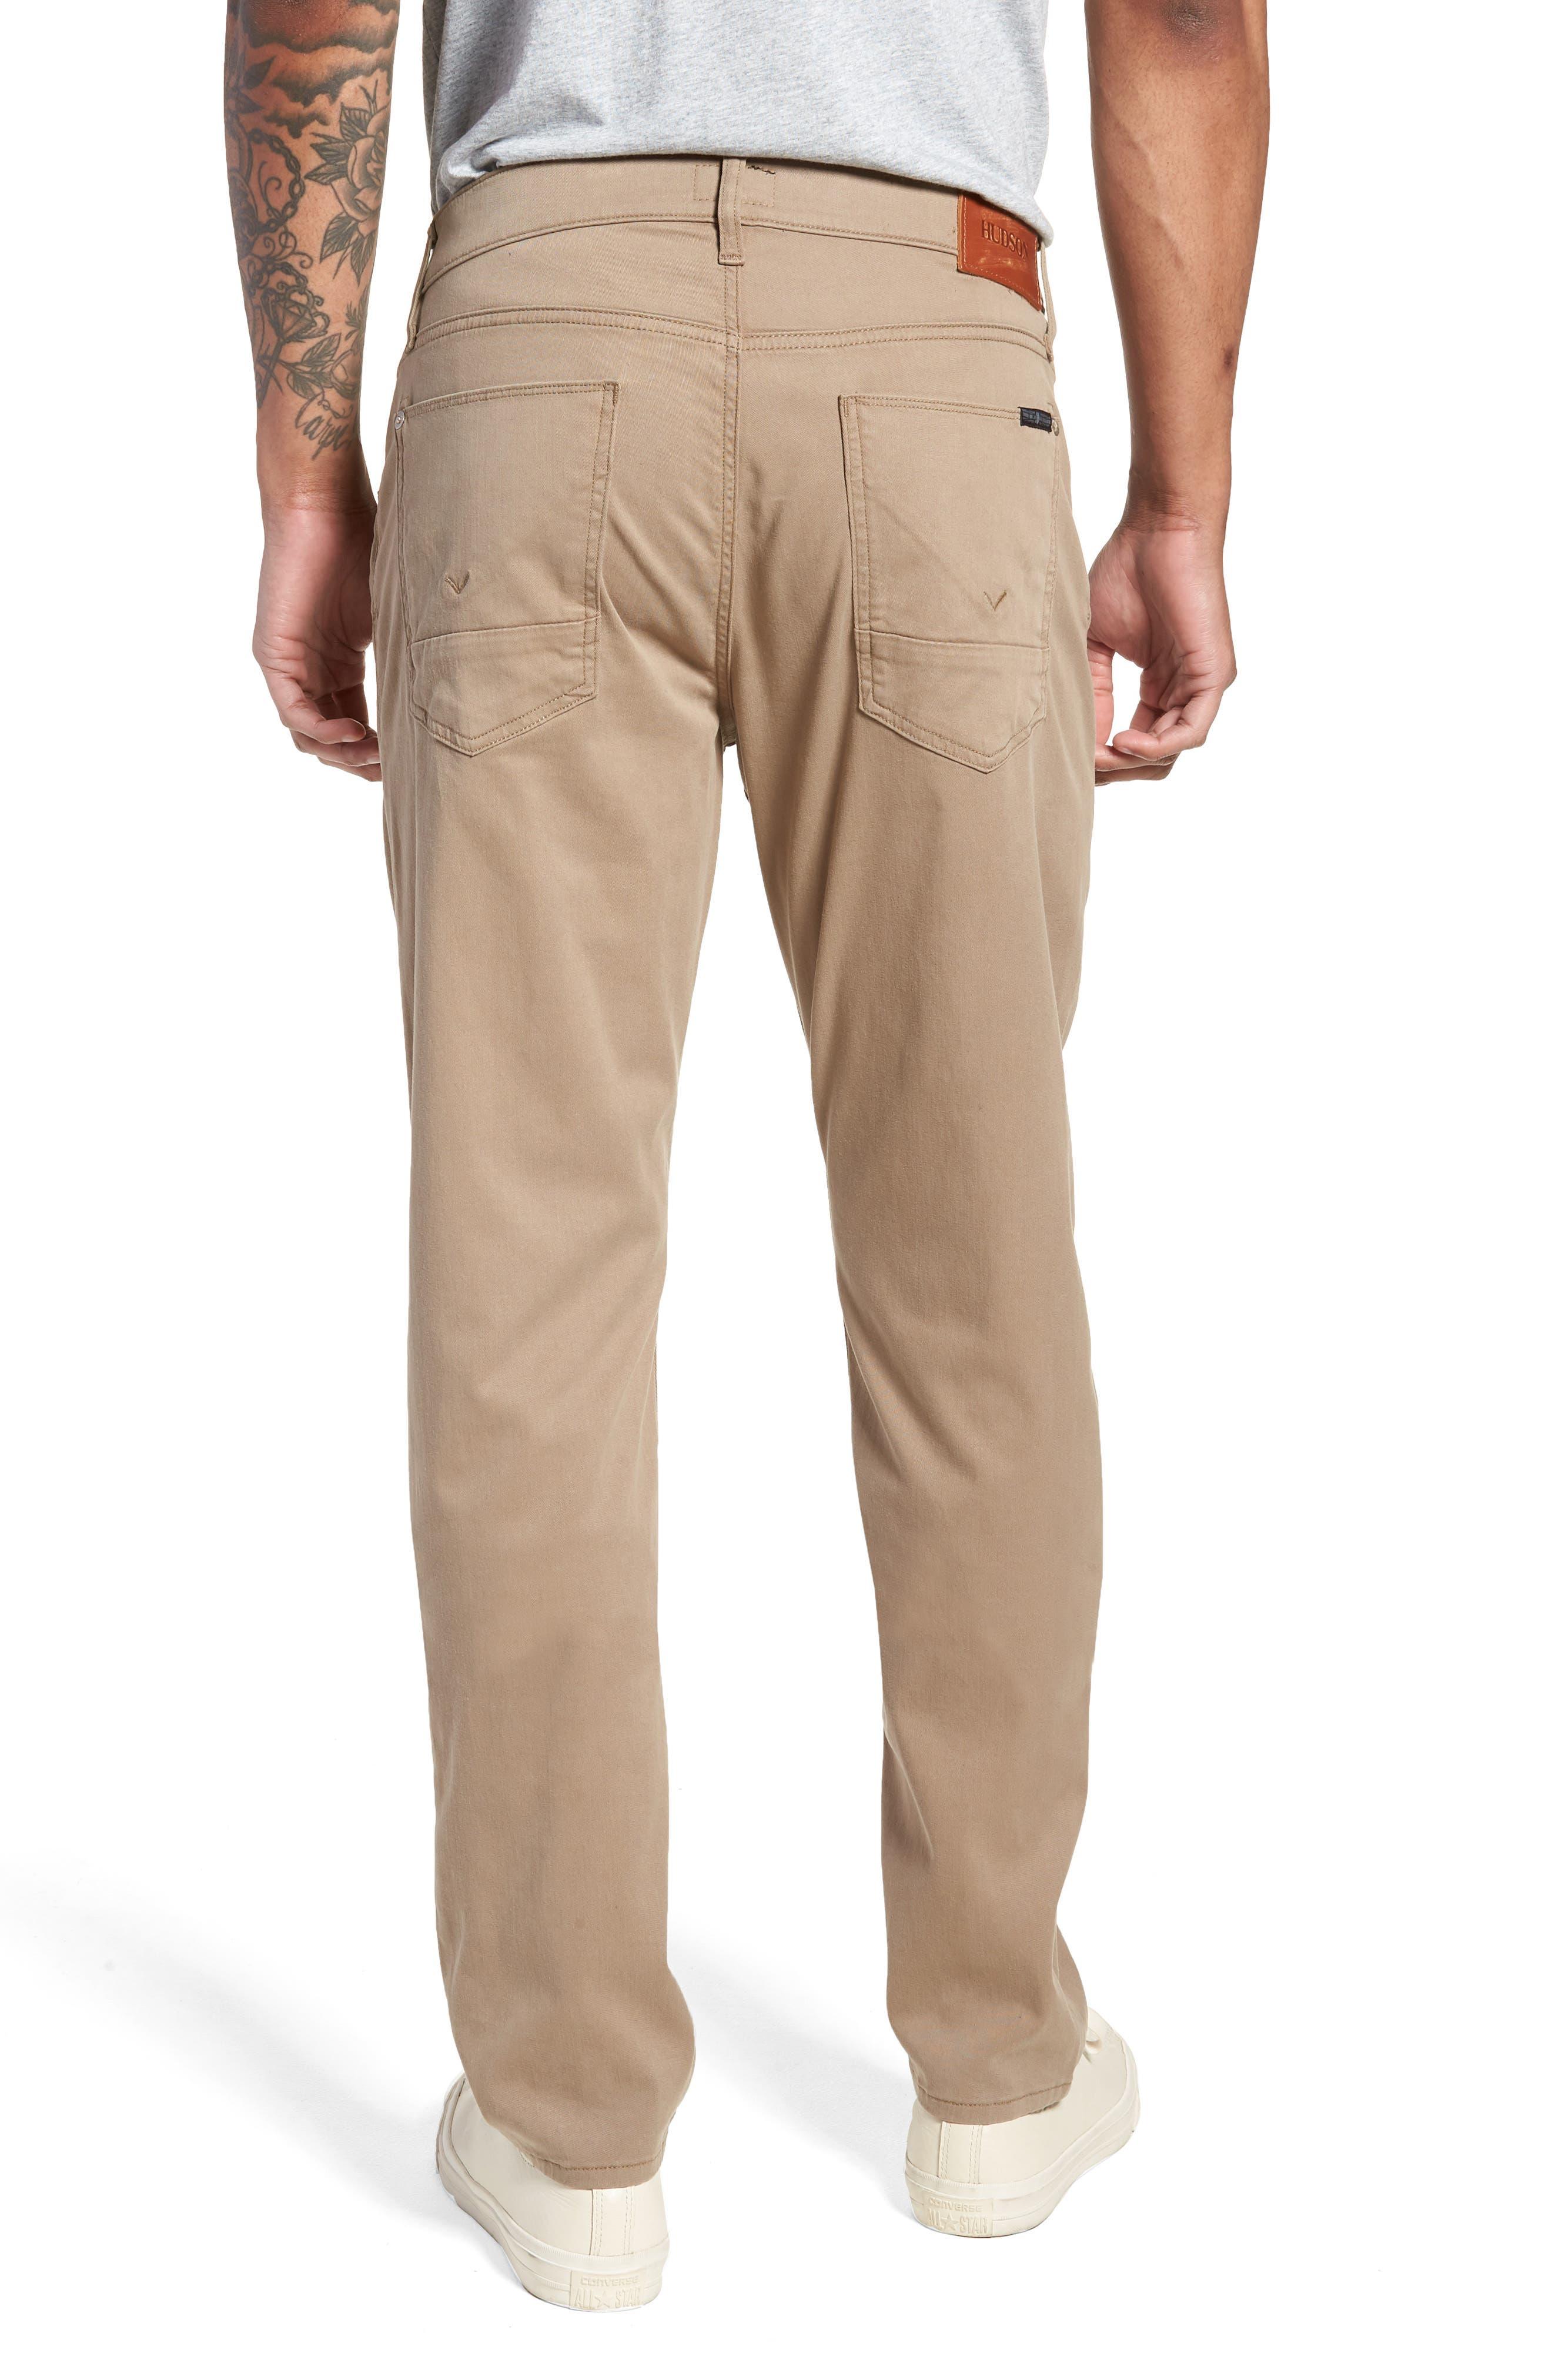 Blake Slim Fit Jeans,                             Alternate thumbnail 2, color,                             Sandman